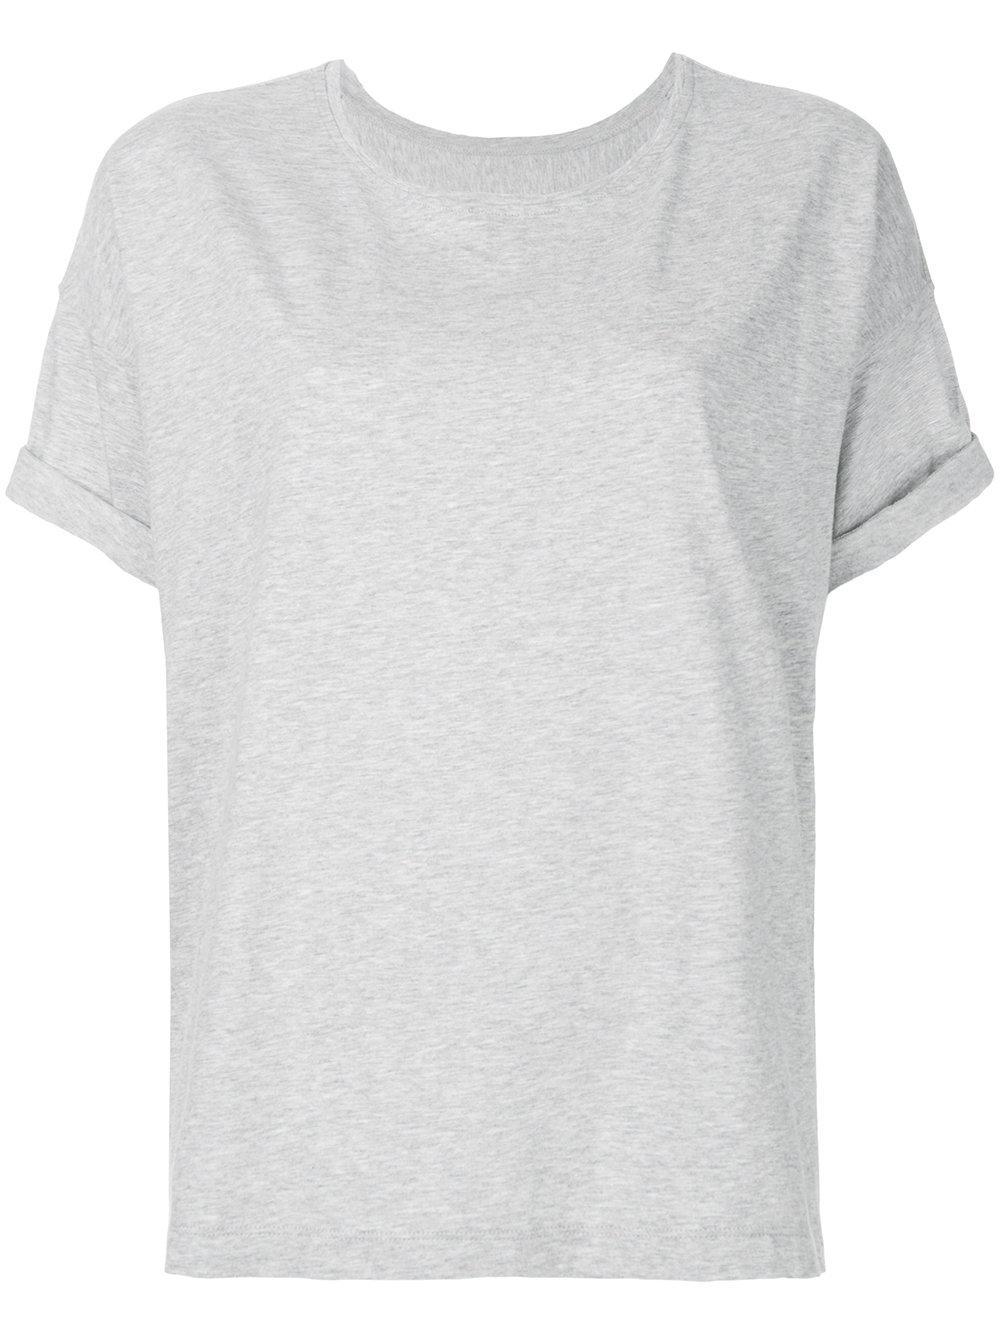 Mm6 Maison Margiela Plain T-shirt